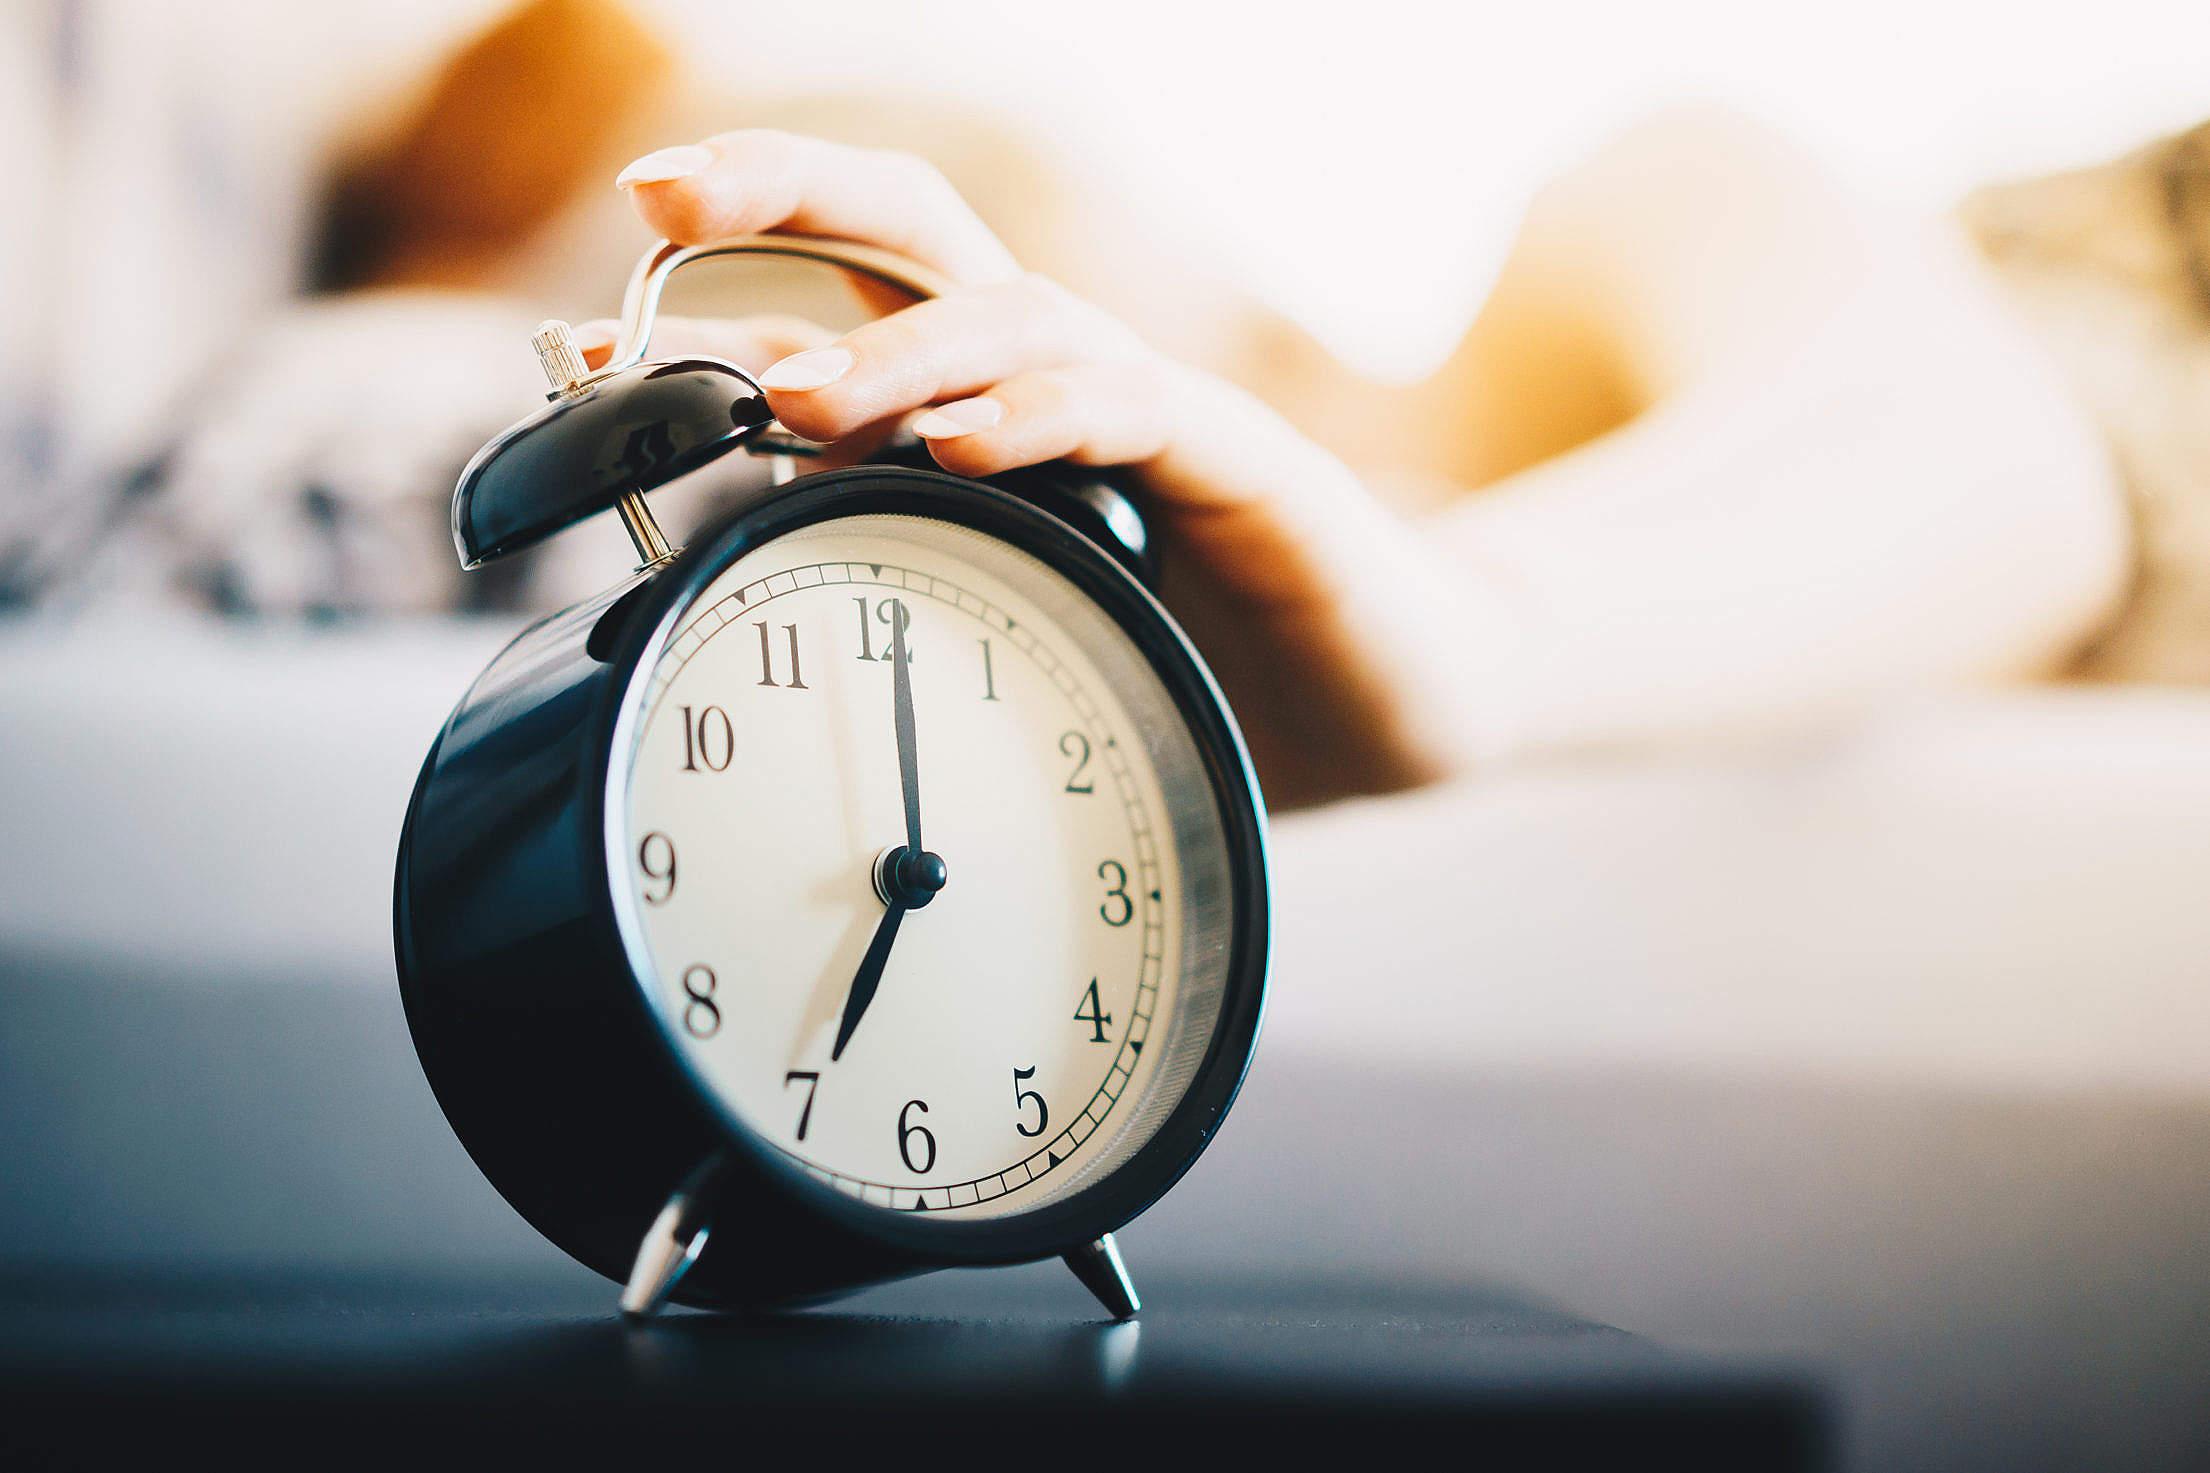 Vintage Alarm Clock Morning Routine Free Stock Photo